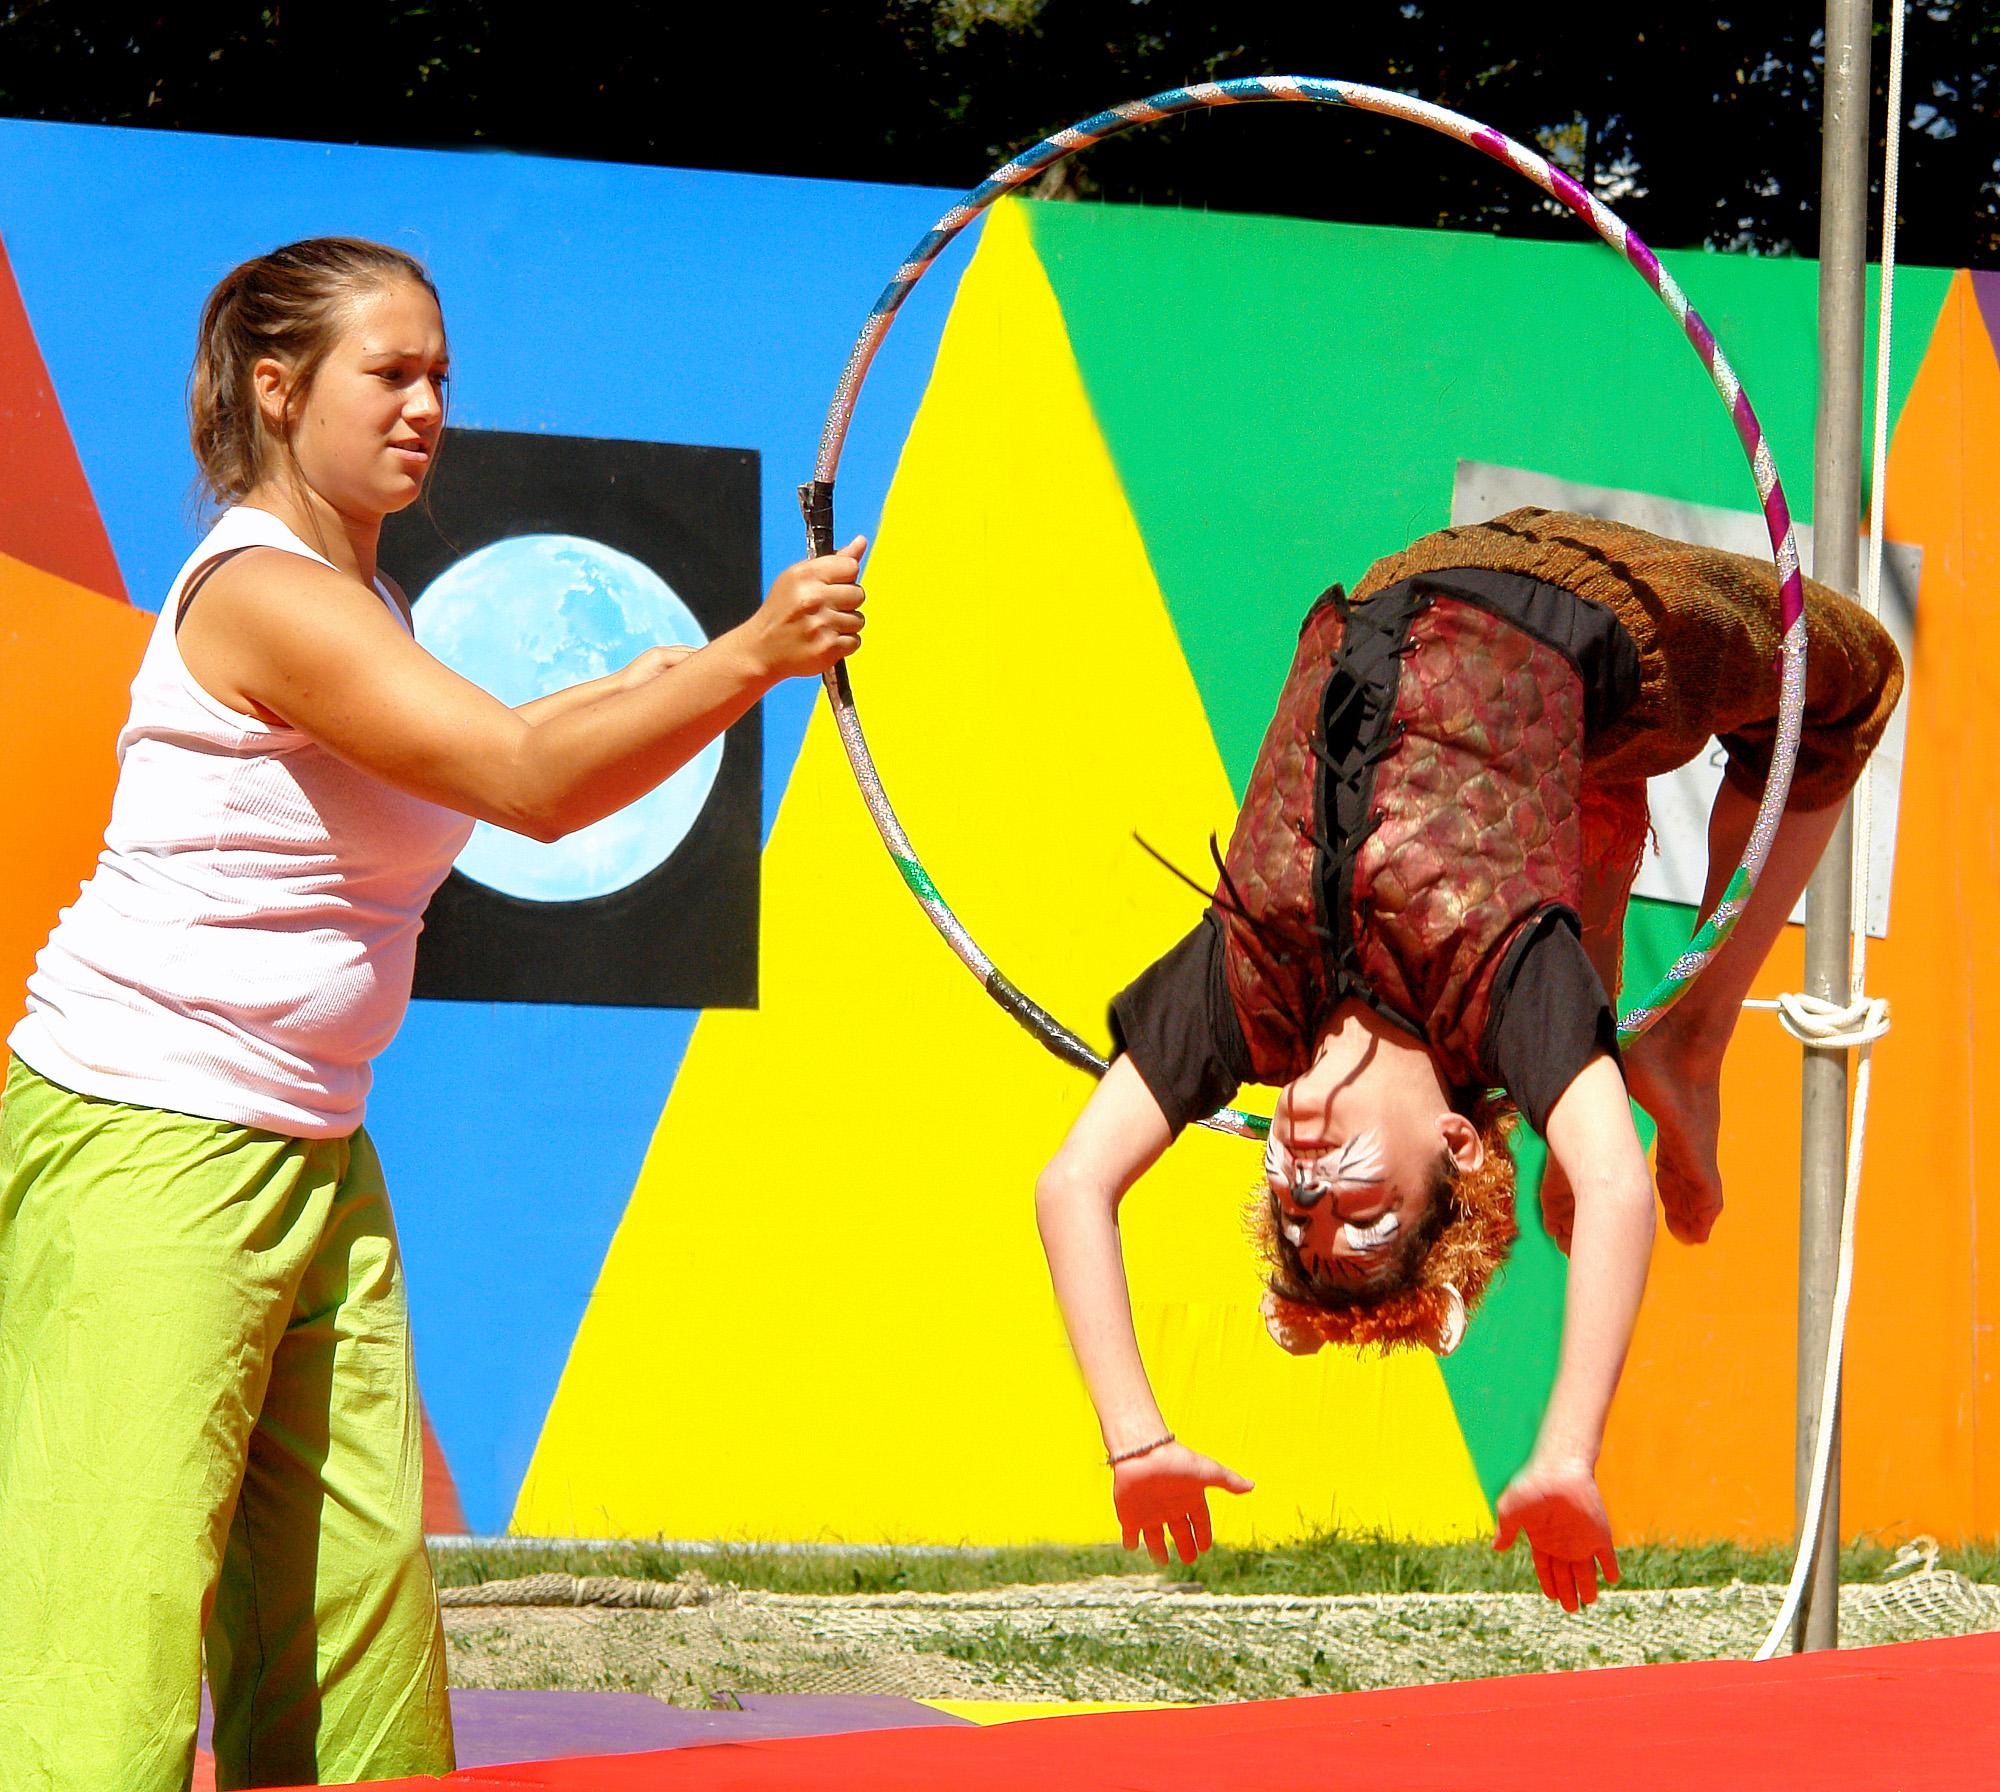 circus_camp_hoop_jump